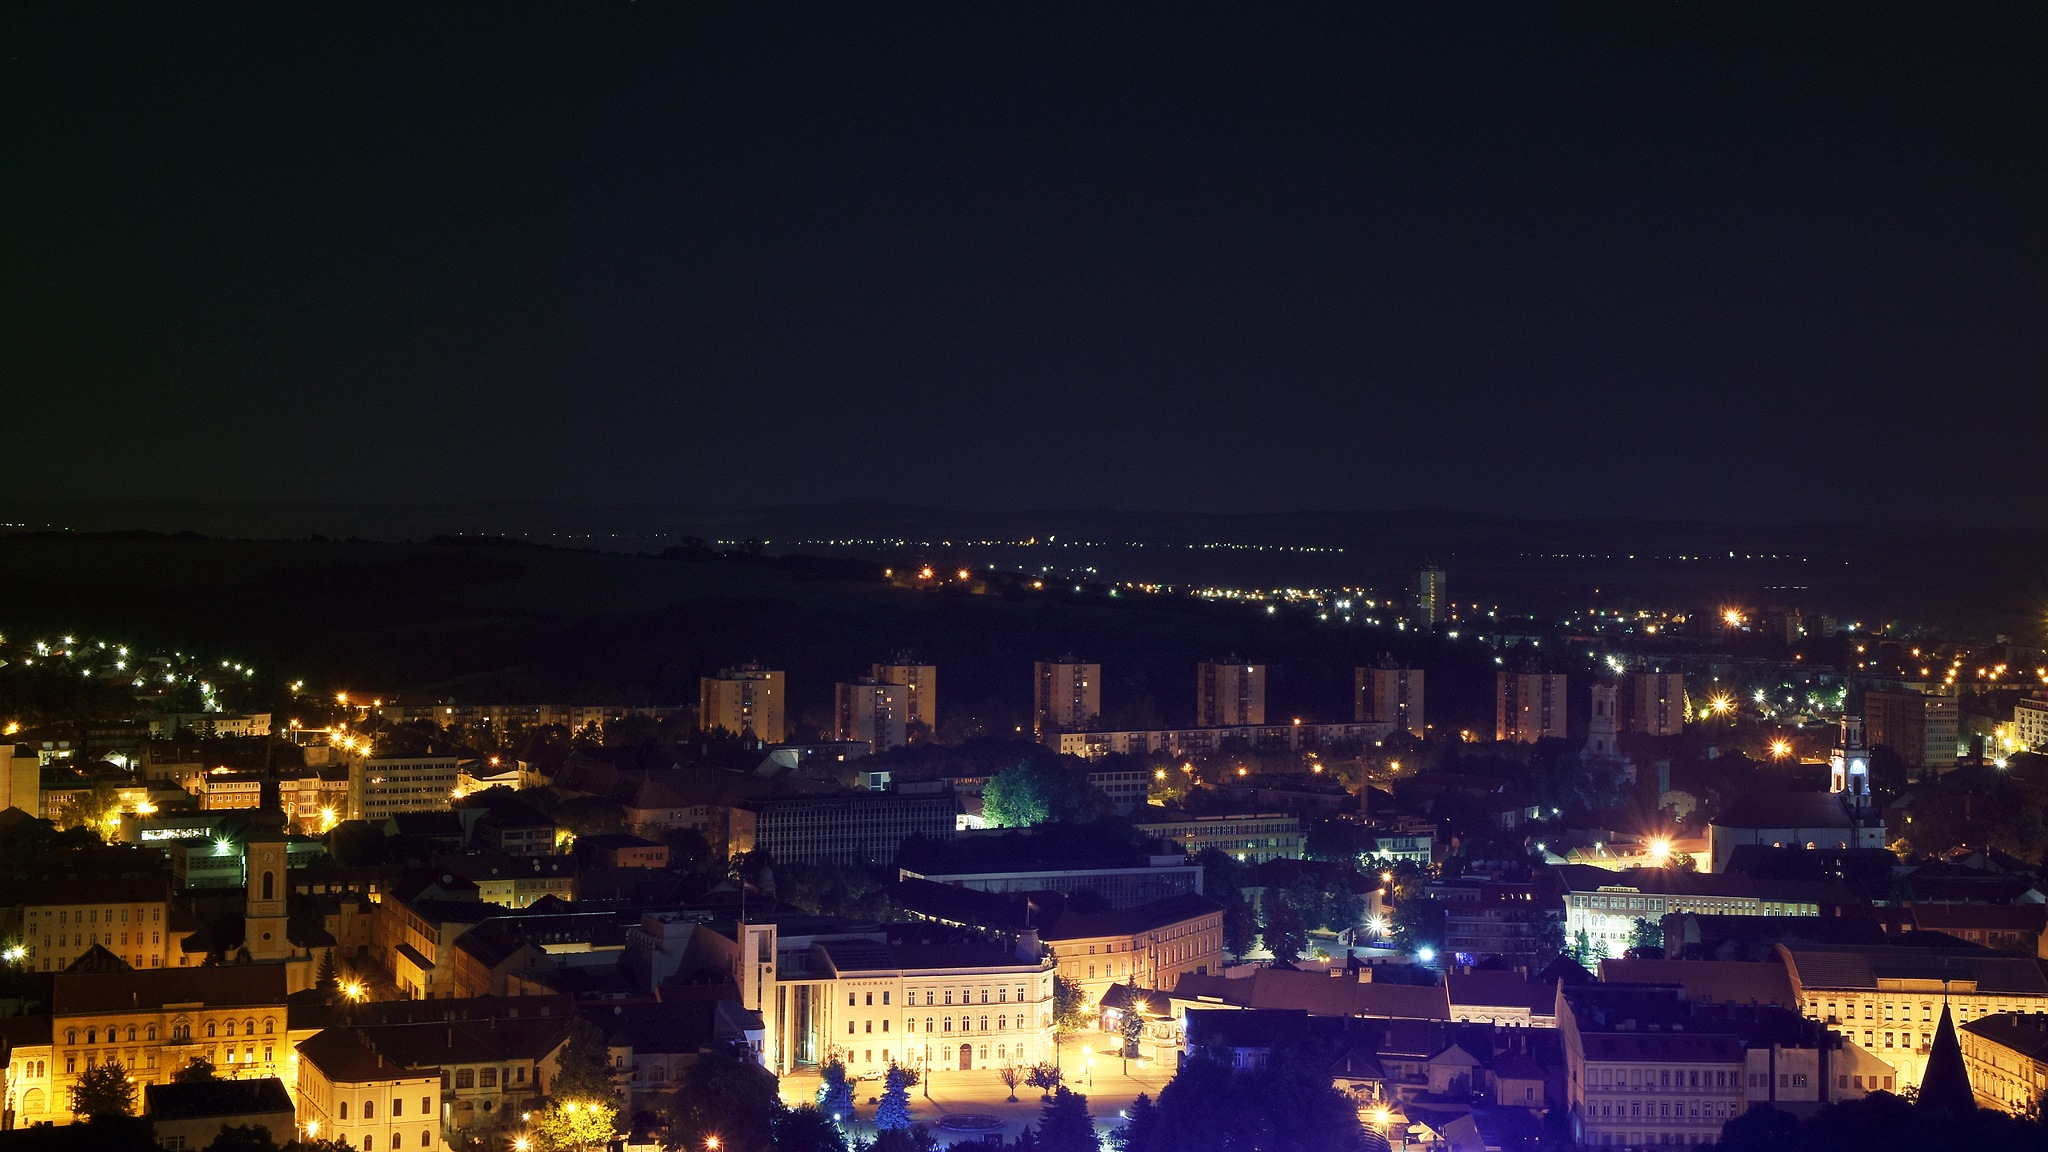 Miskolc by Adrián Bardi